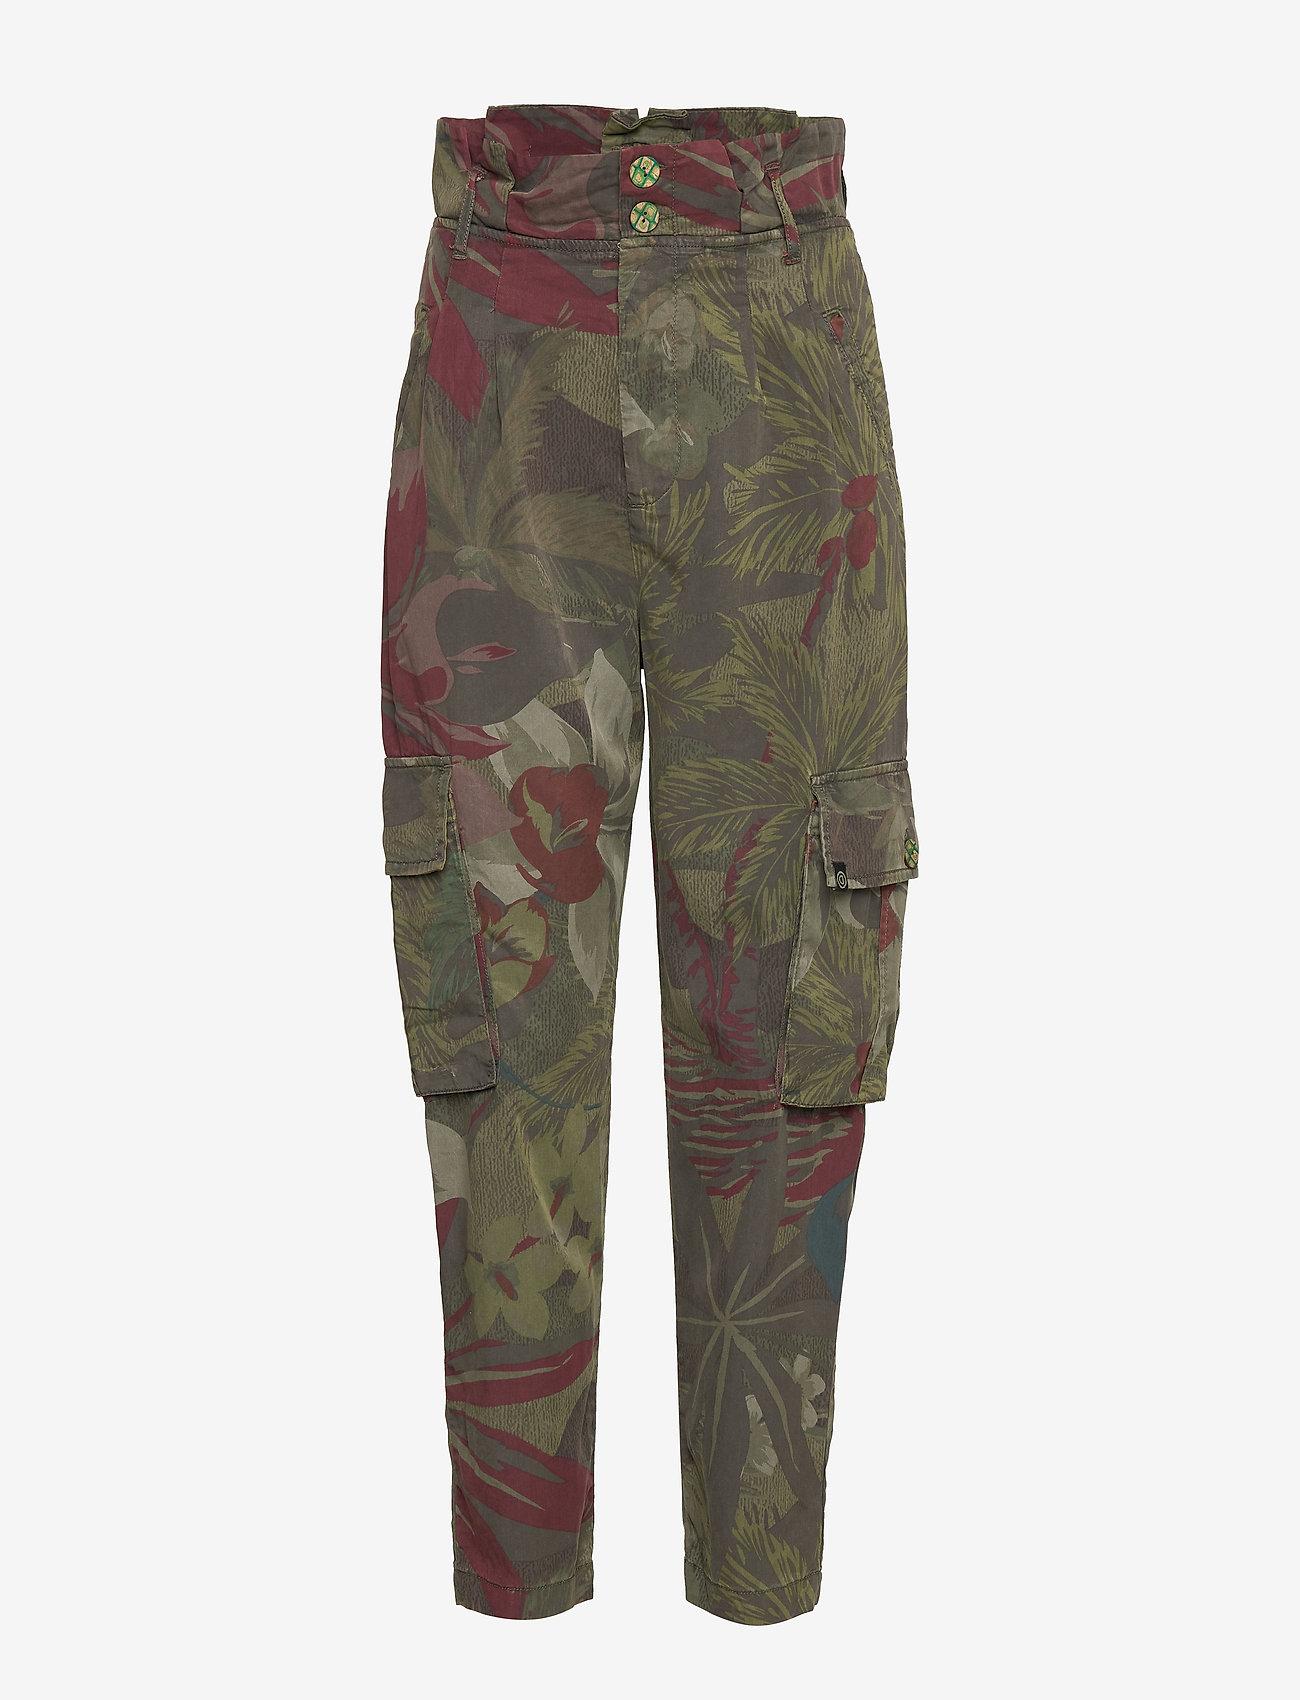 Pant Wildyou (Verde Militar) (824.25 kr) - Desigual